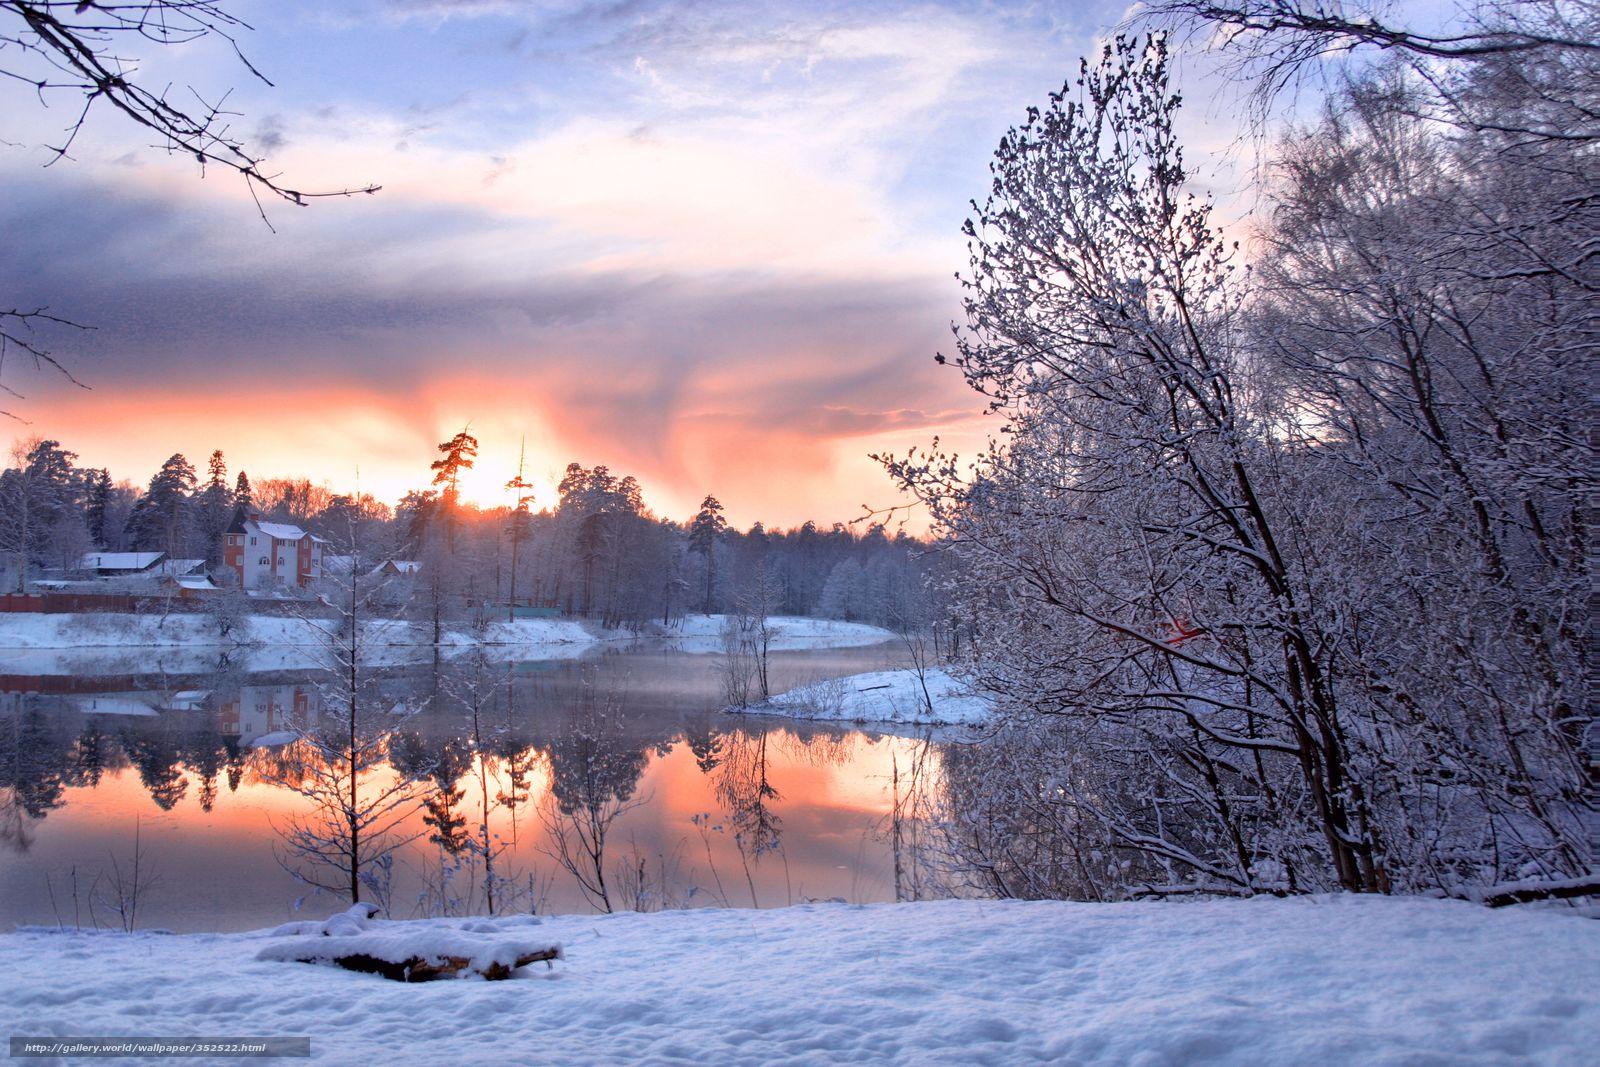 Scaricare gli sfondi inverno freddo neve cielo sfondi for Sfondi gratis desktop inverno